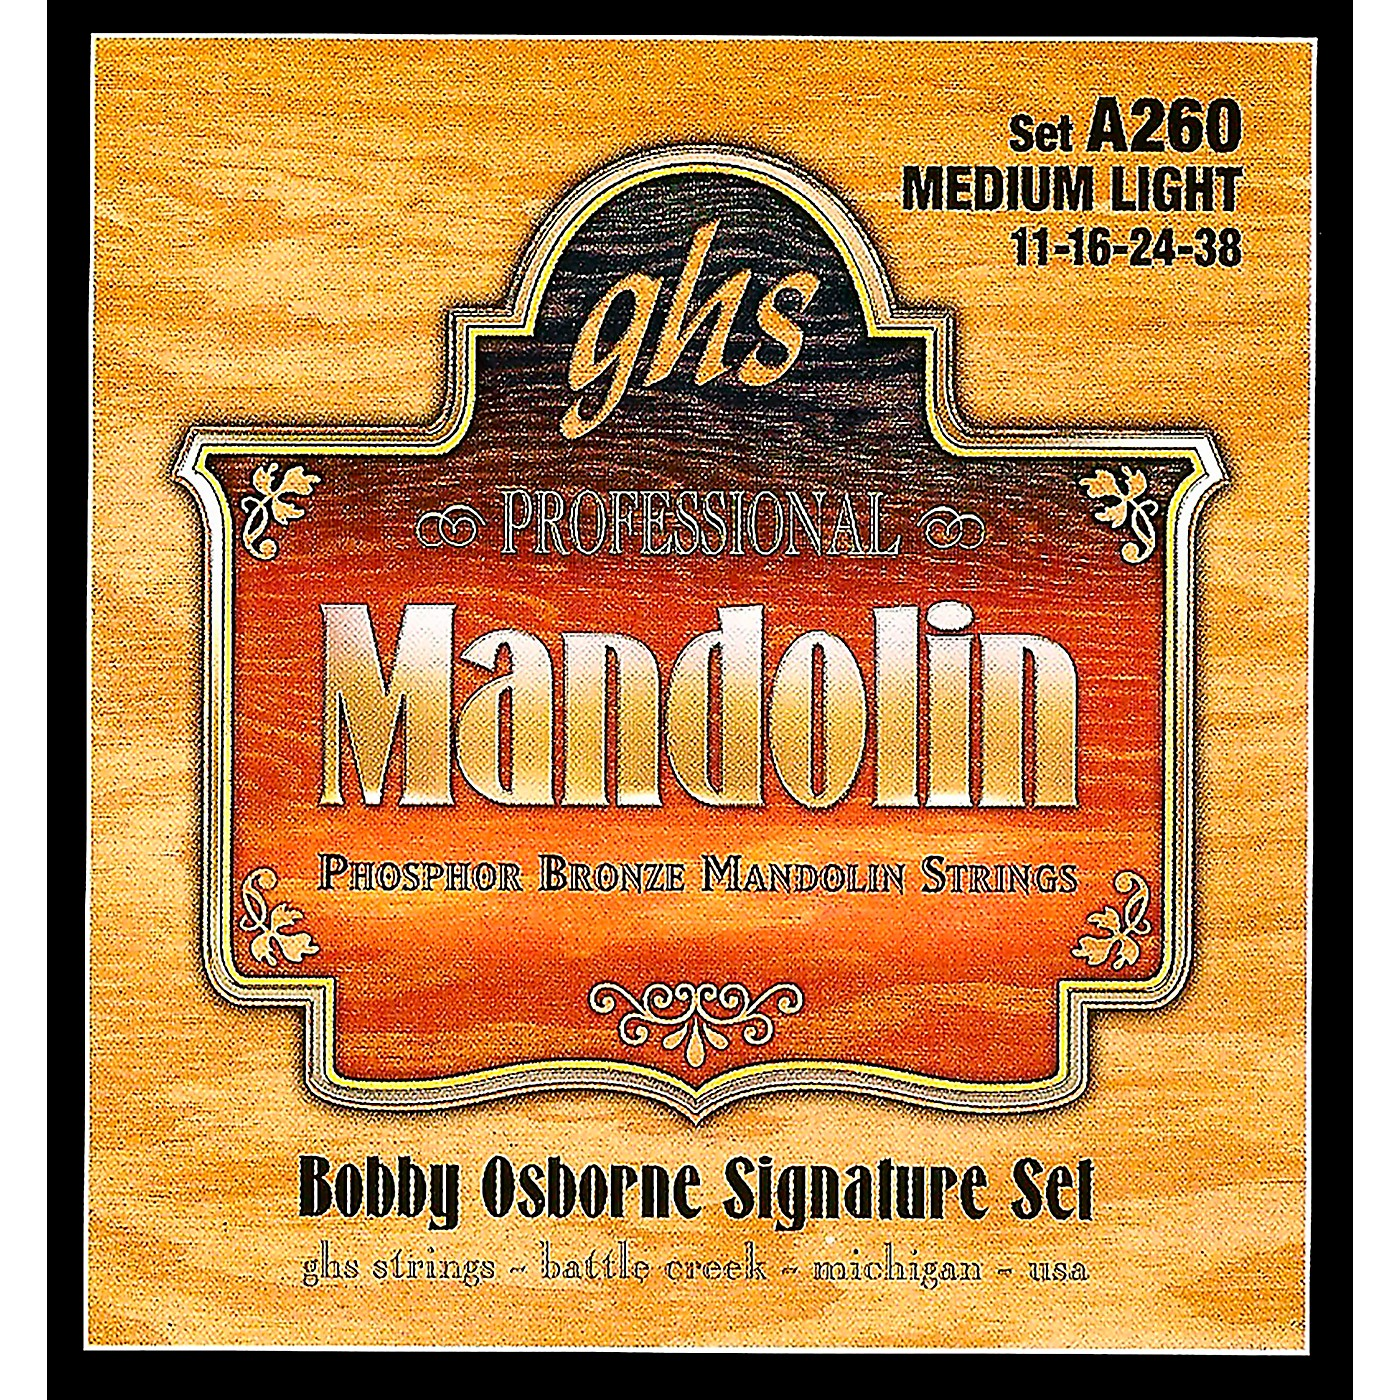 GHS Phosphor Bronze Mandolin Strings Medium Light thumbnail